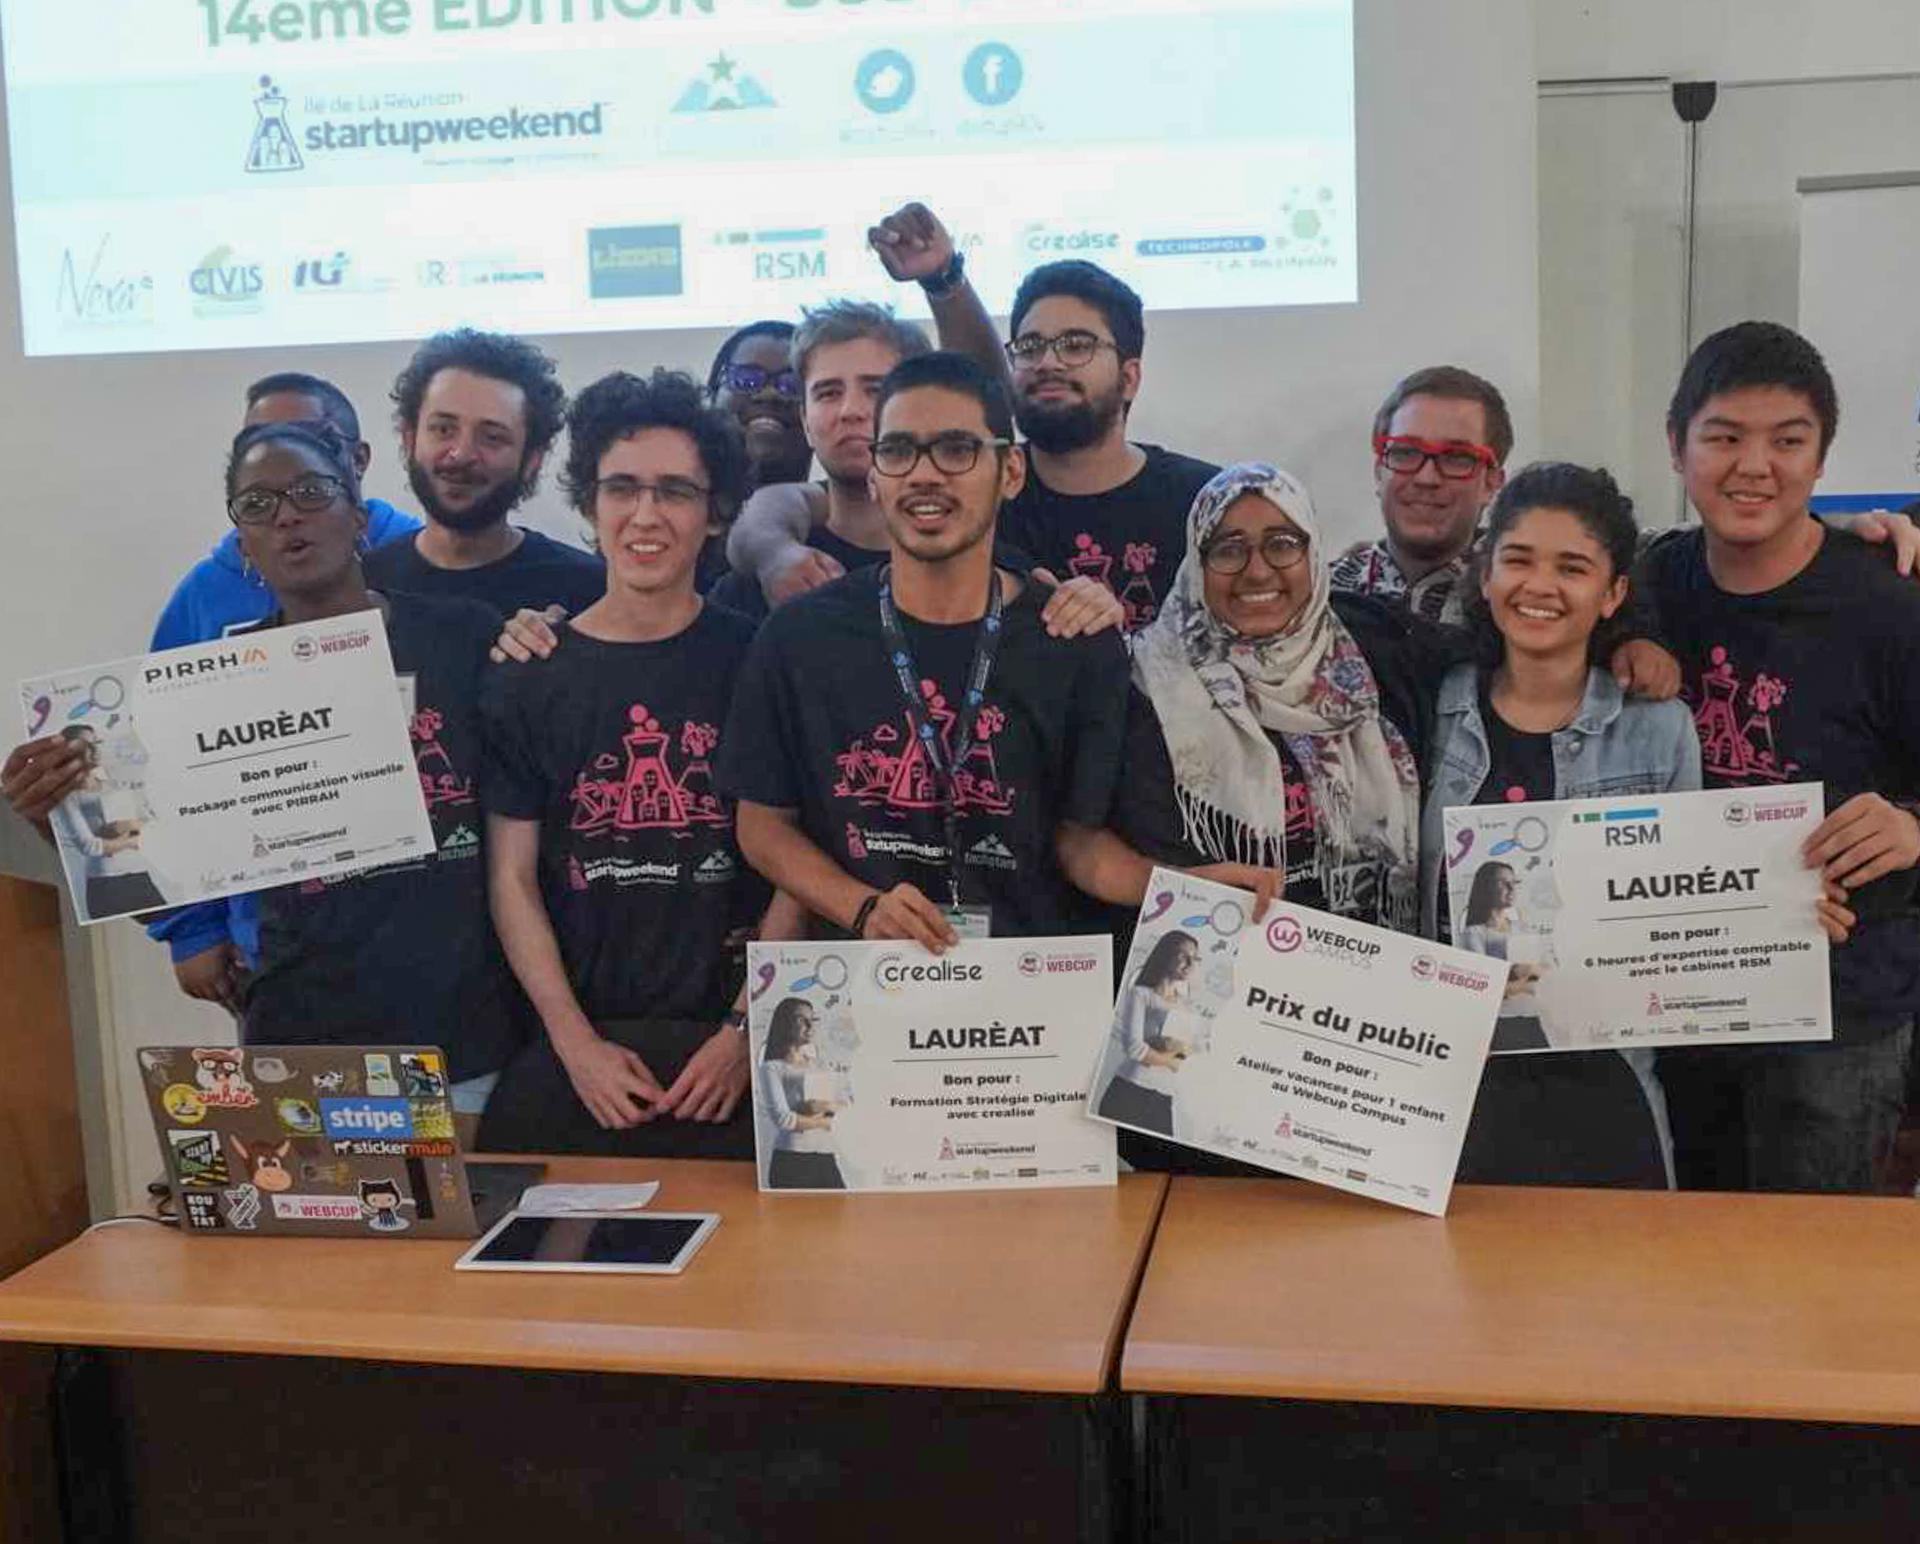 Les gagnants du Startupweekend